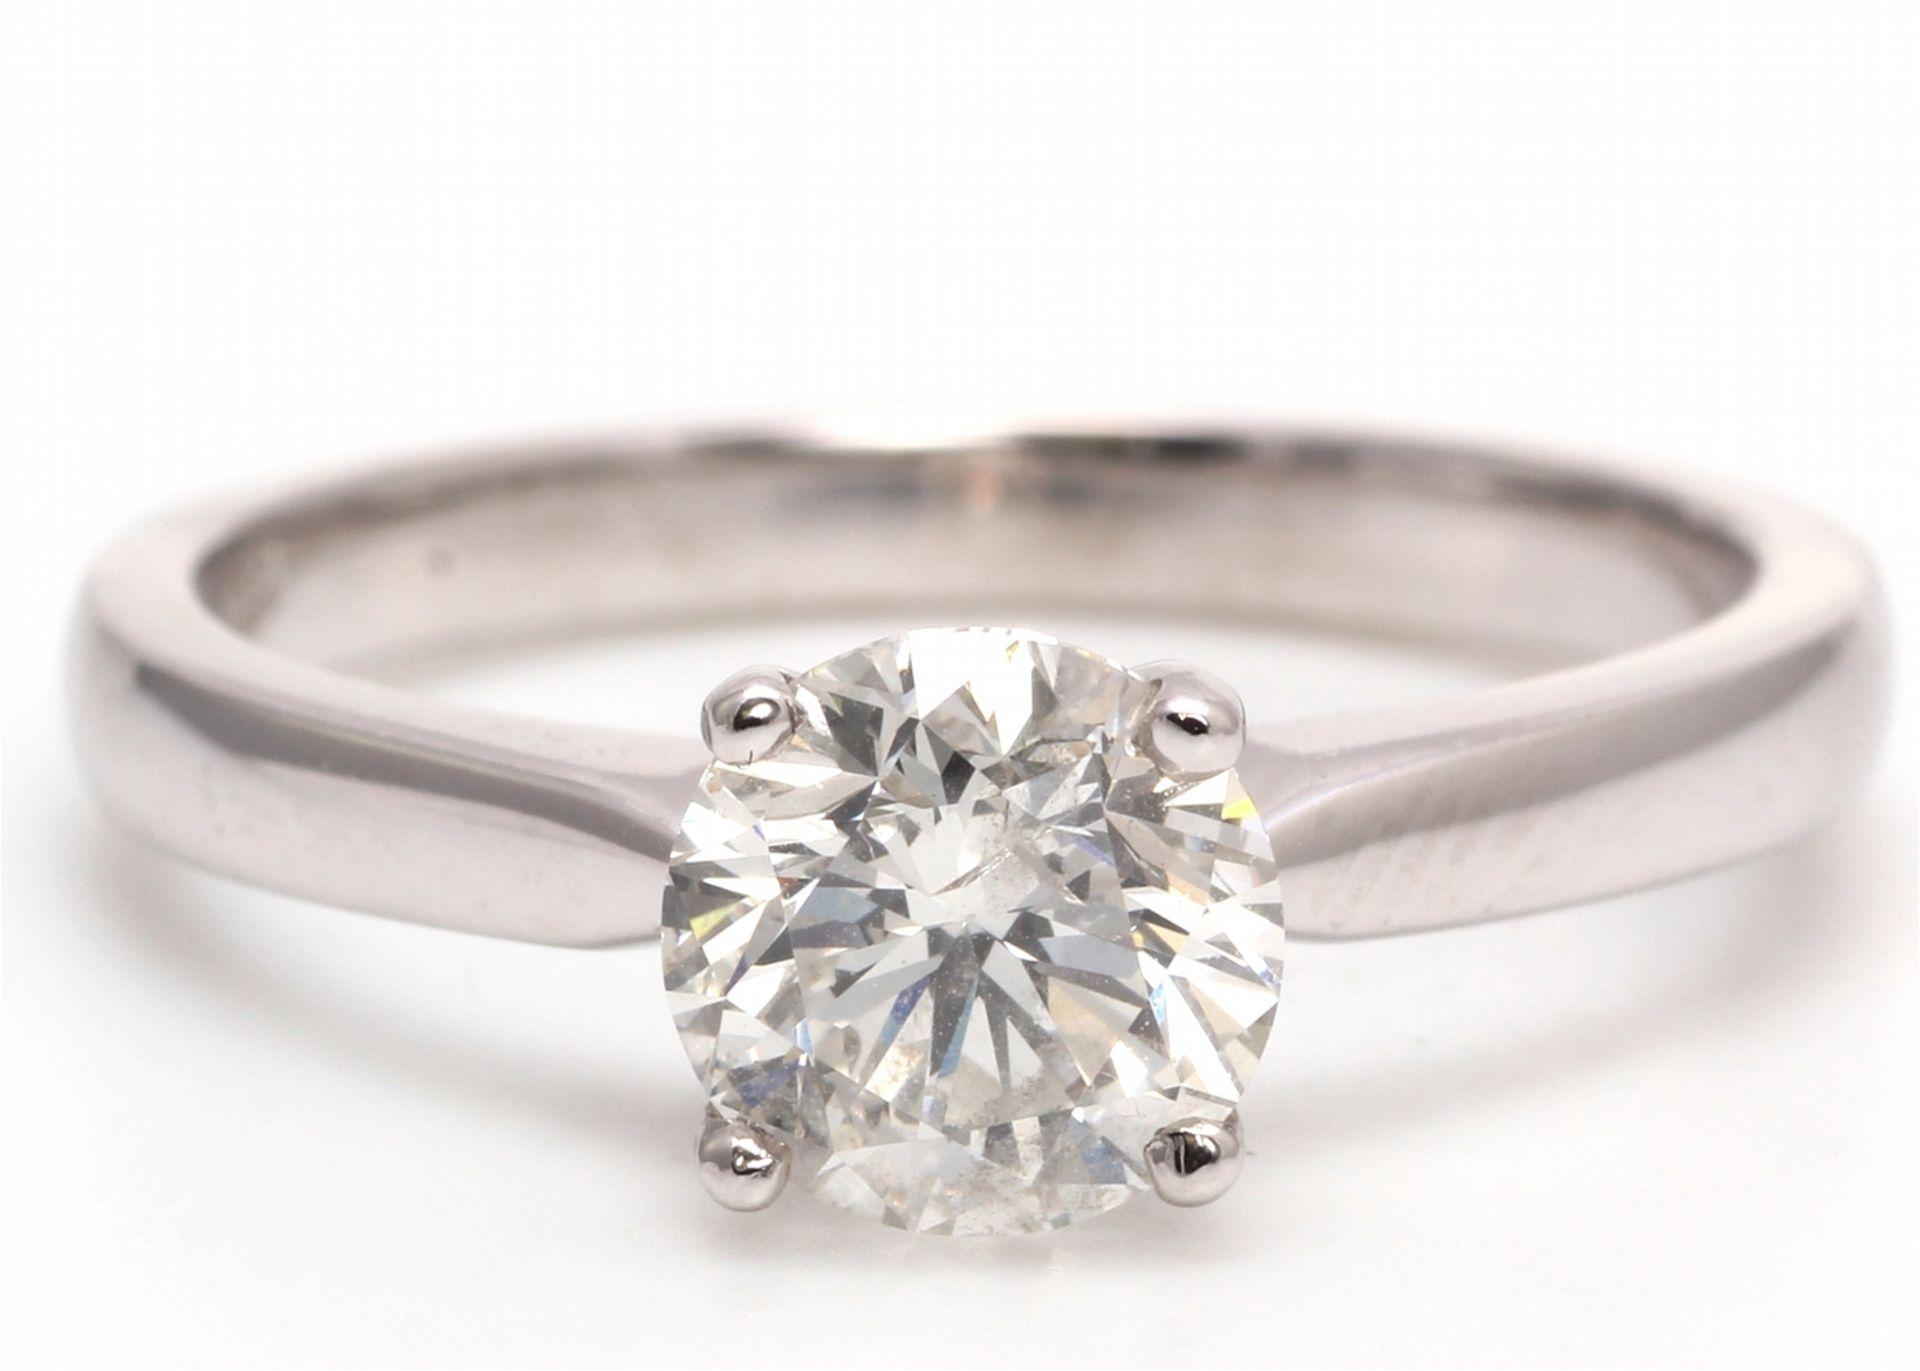 Lot 12 - 18k White Gold Single Stone Diamond Ring 1.05